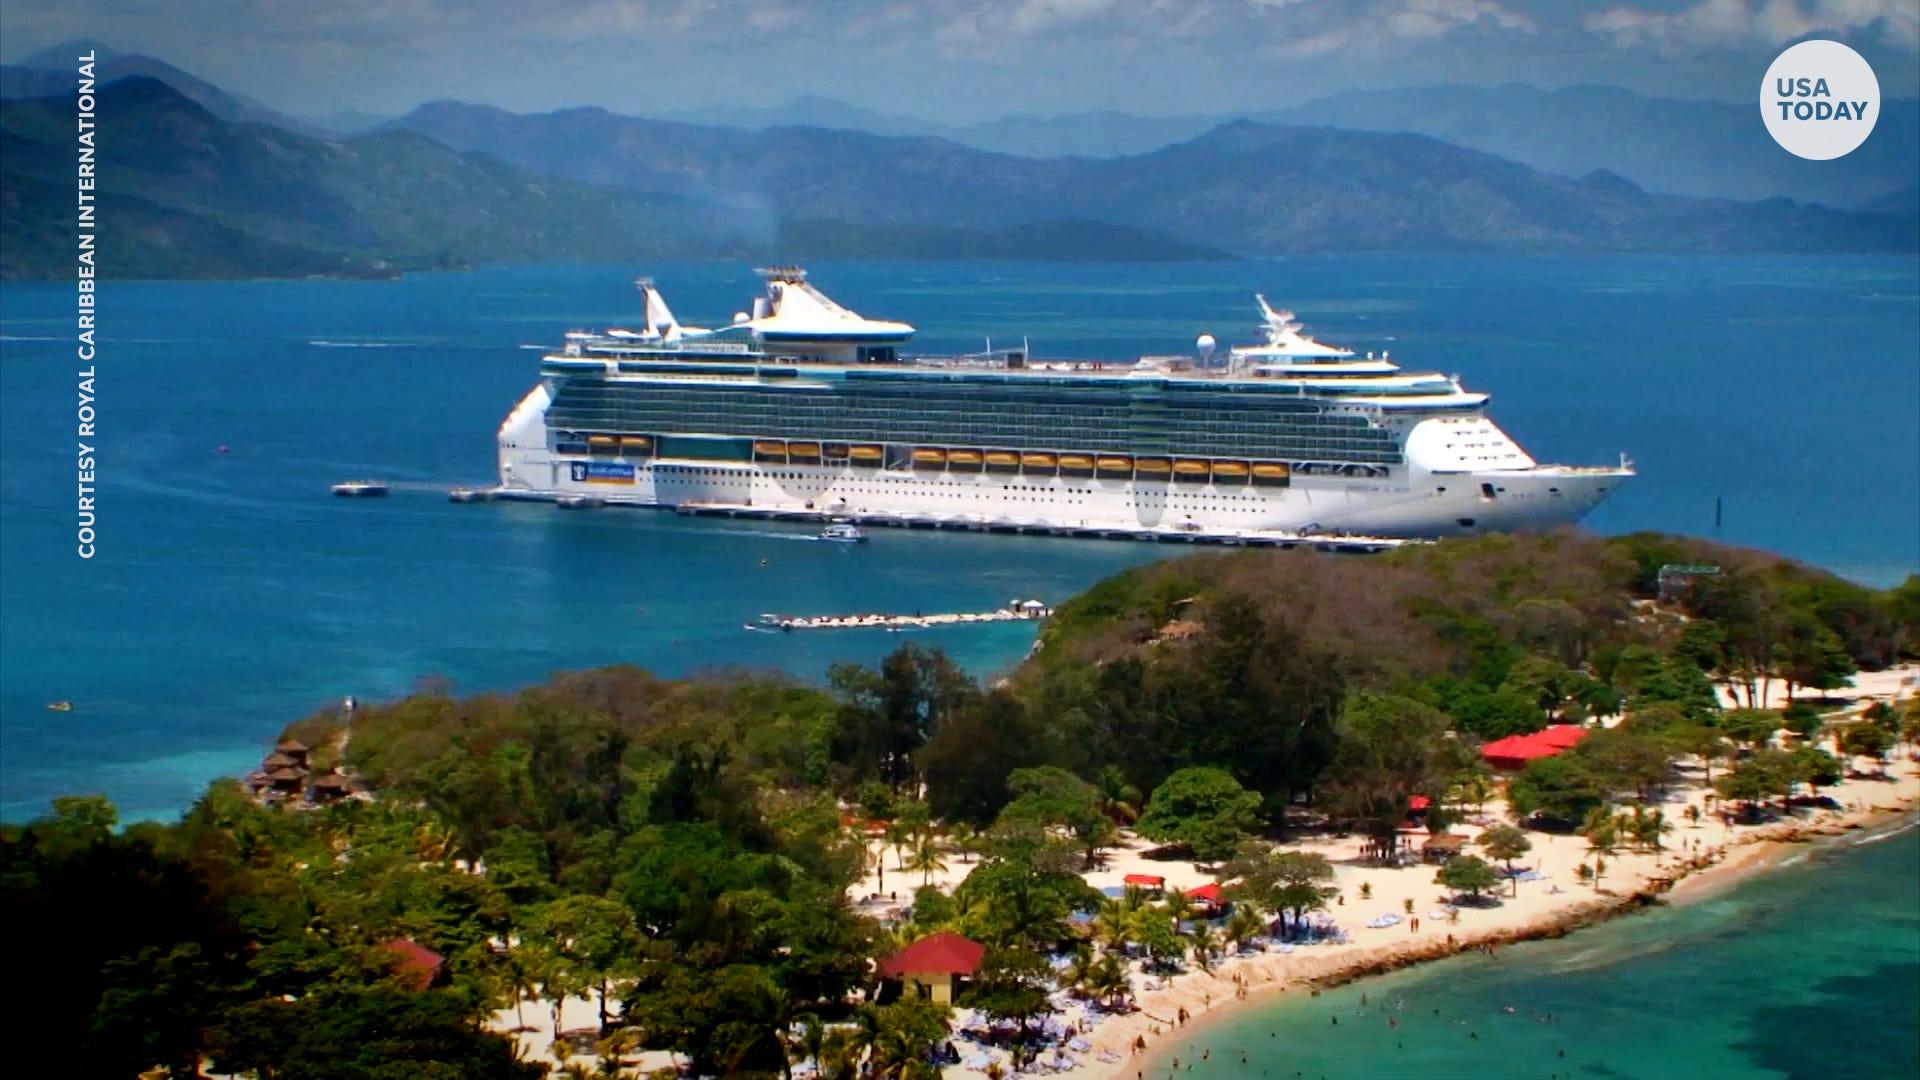 Ready to set sail? Royal Caribbean announces summer cruises from Texas, Florida ports